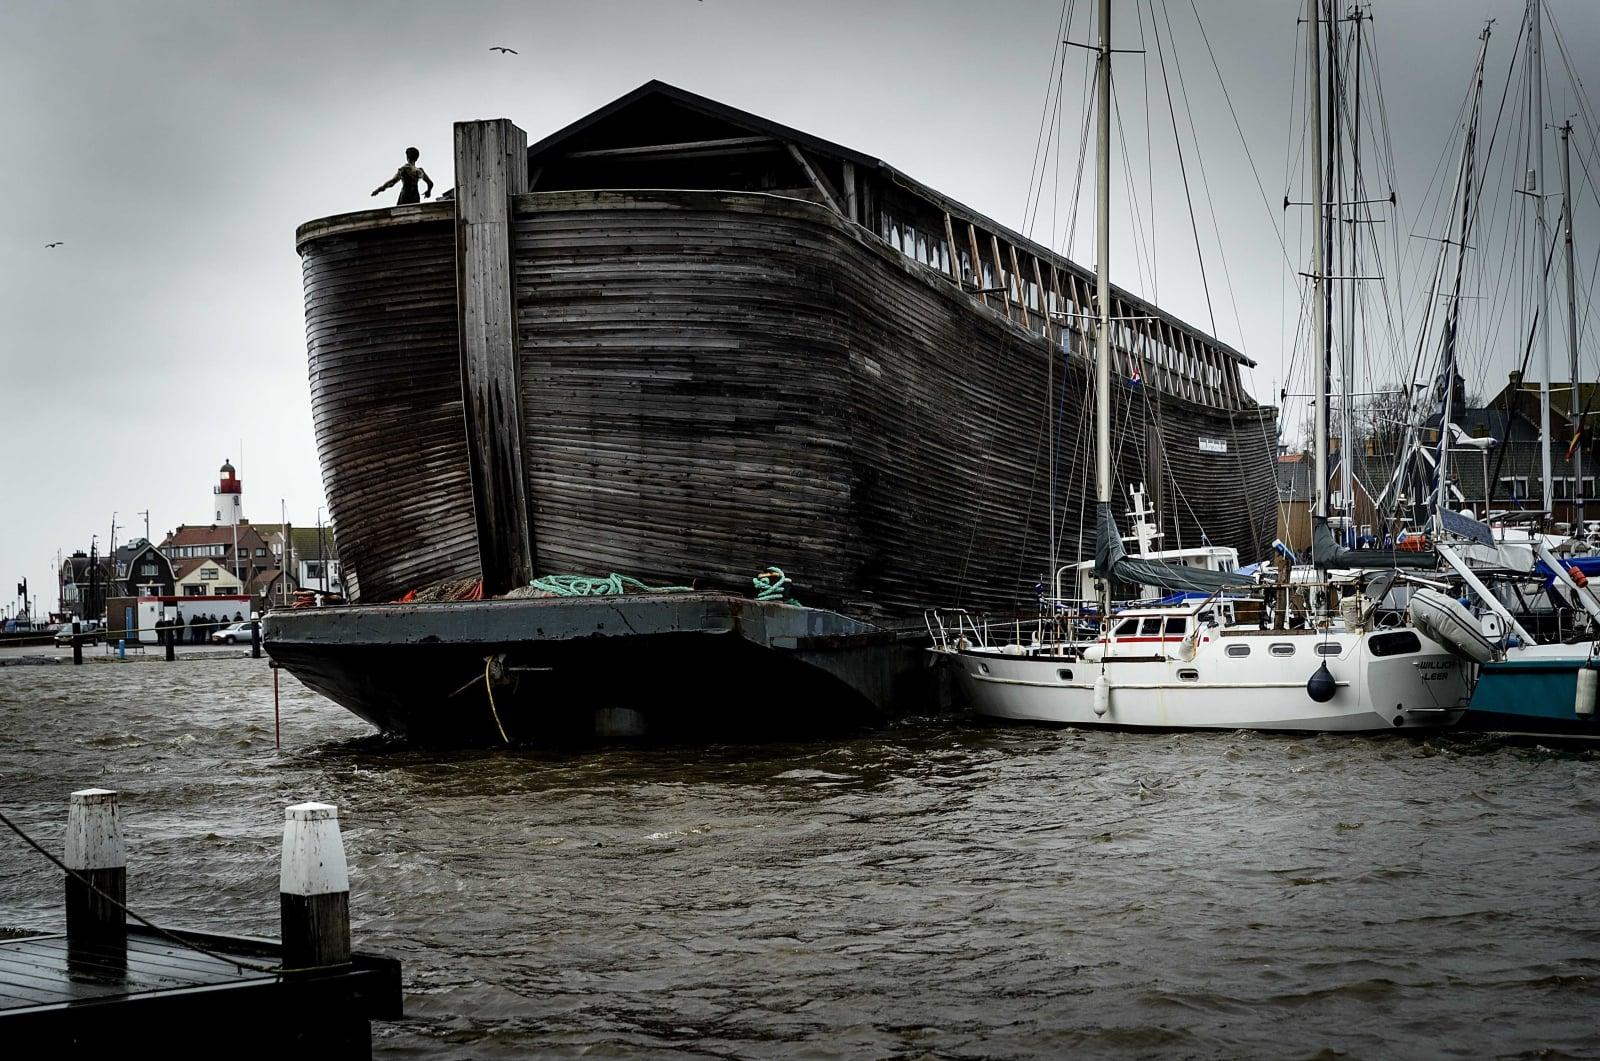 Sztorm w Holandii EPA/ROBIN VAN LONKHUIJSEN